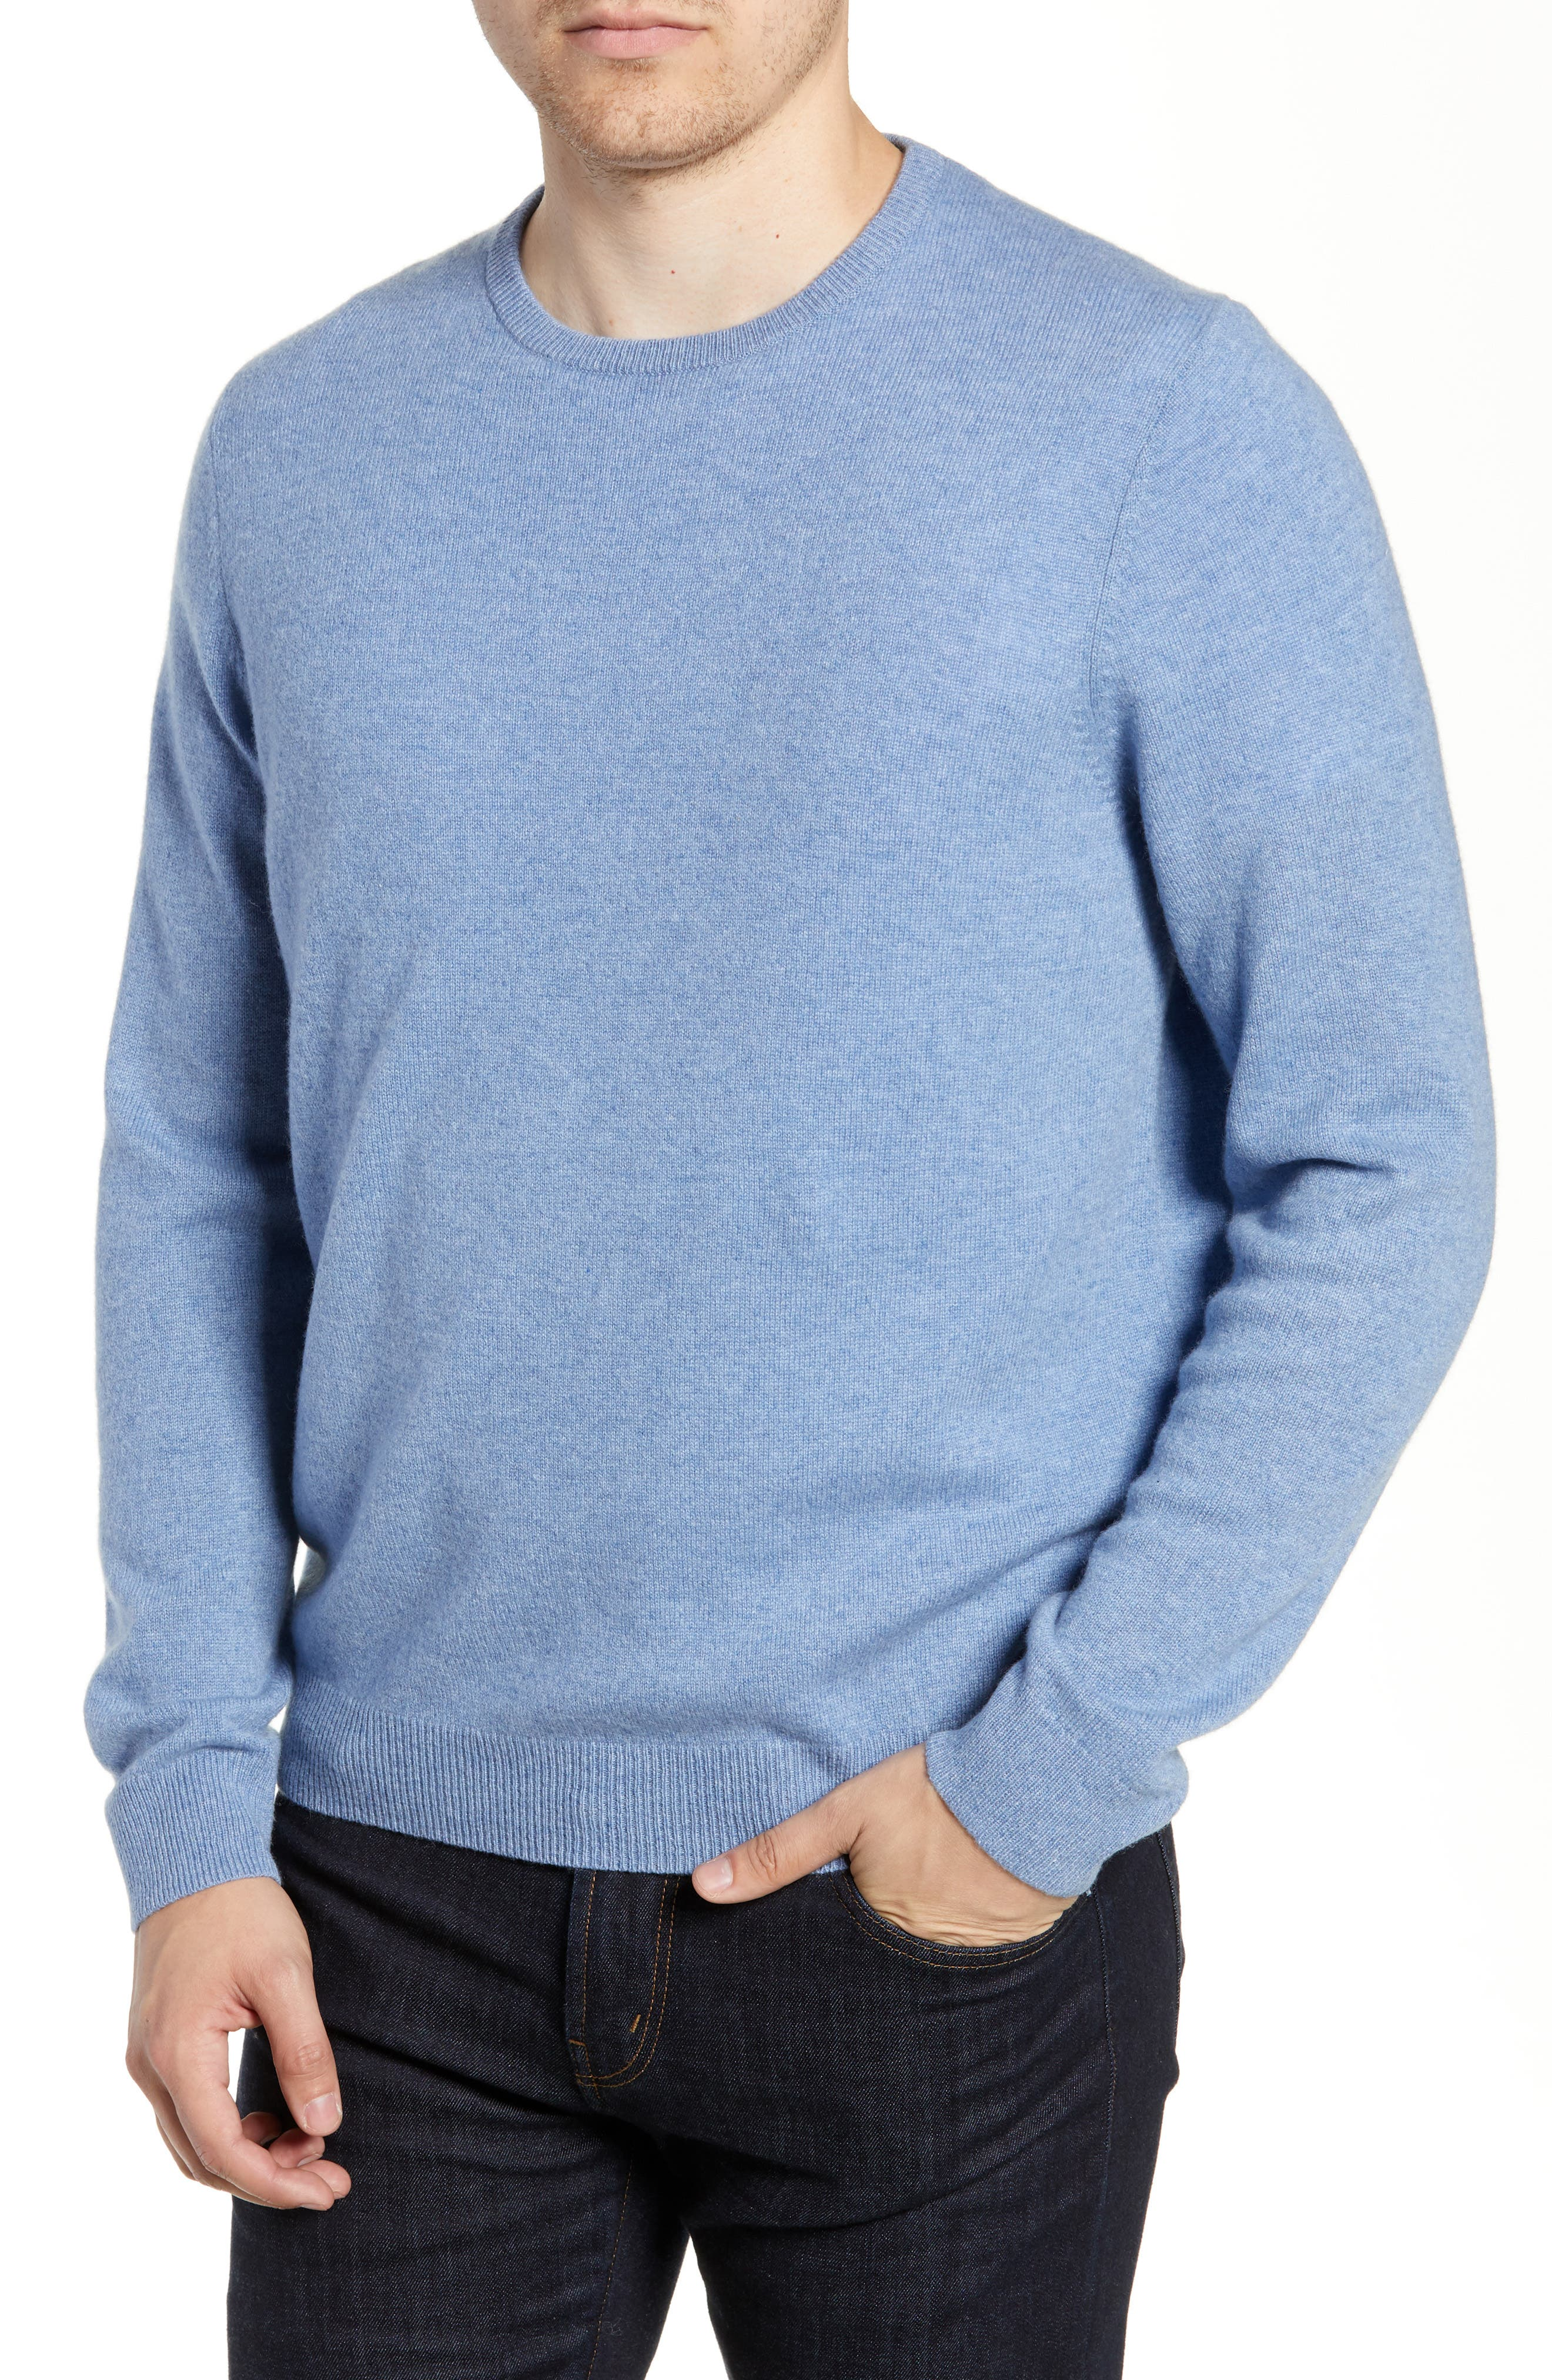 Nordstrom Shop Cashmere Crewneck Sweater, Blue